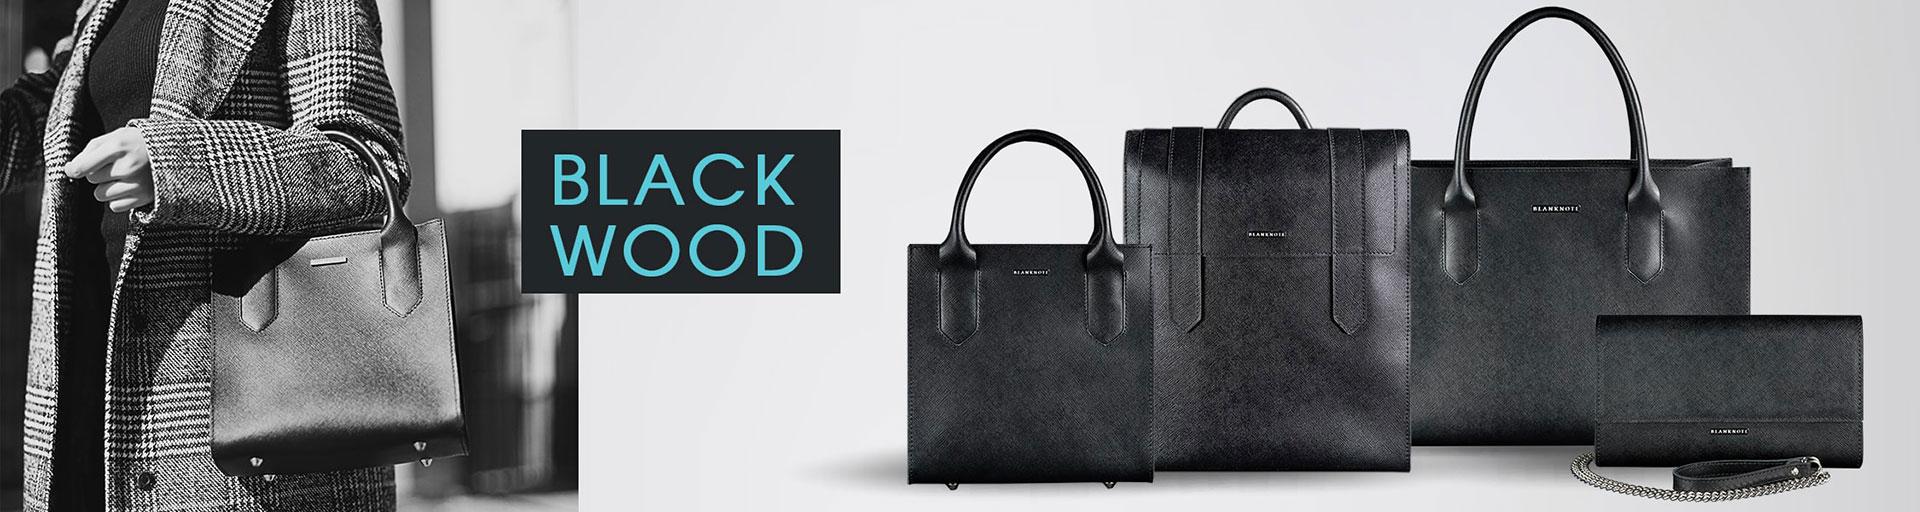 banner-blackwood